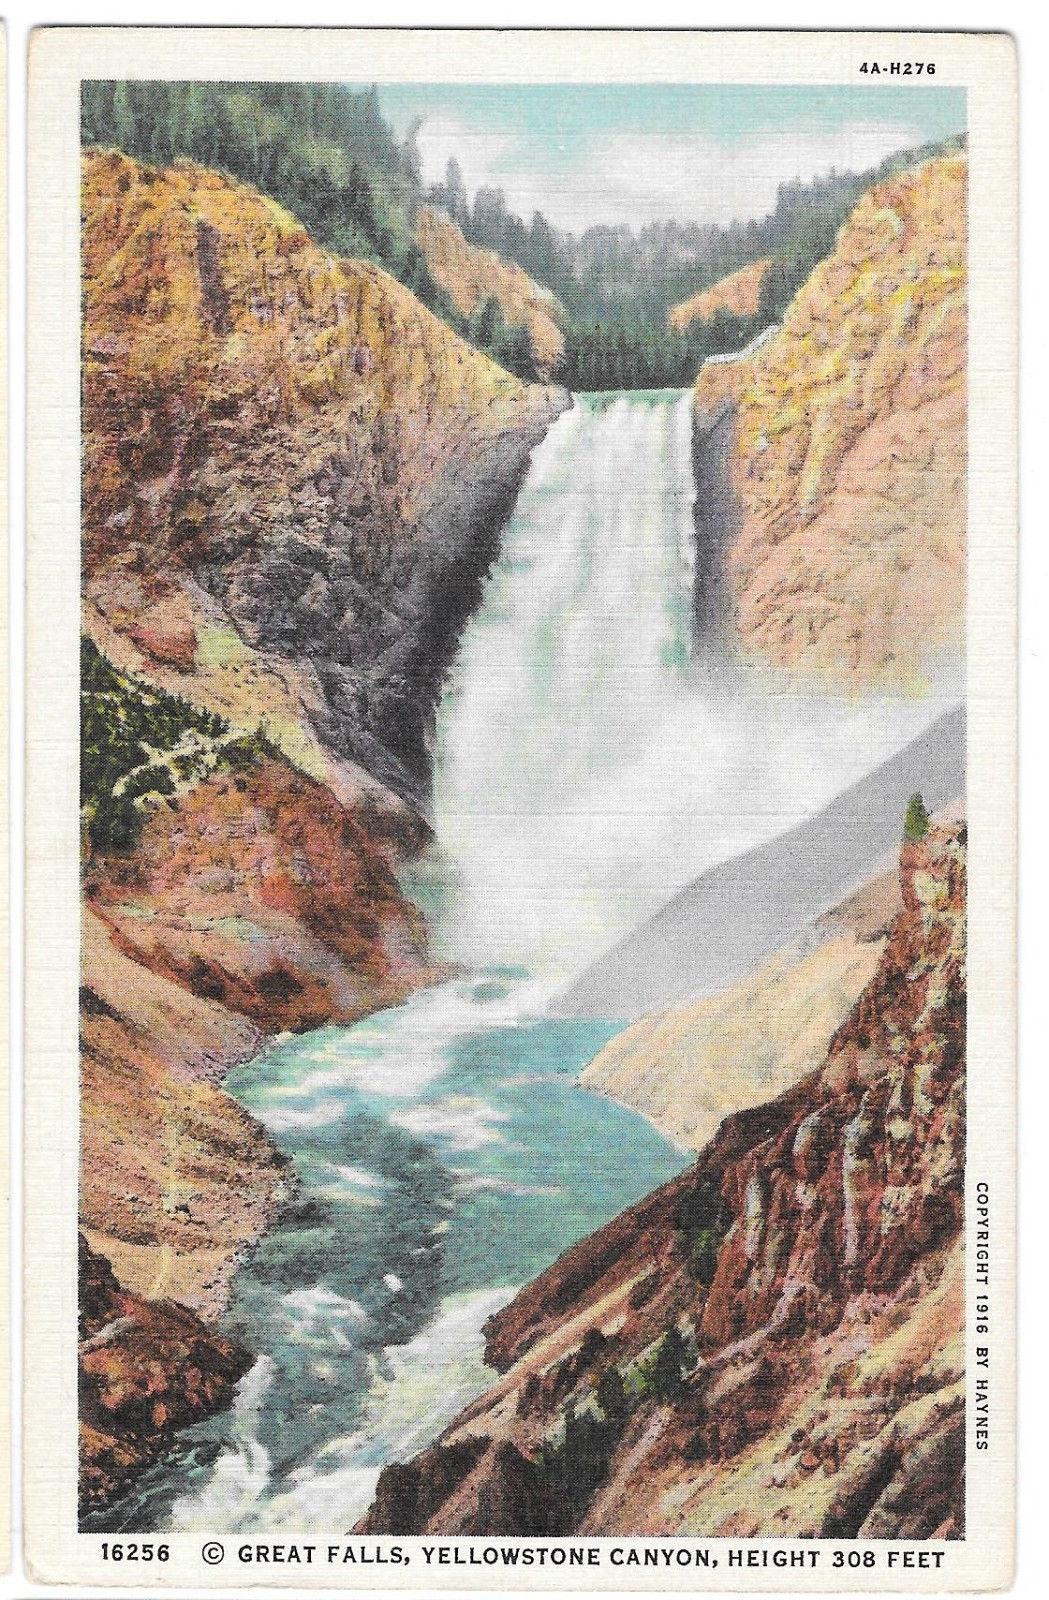 WY Yellowstone Canyon Great Falls Vtg Haynes Linen Postcard Wyoming